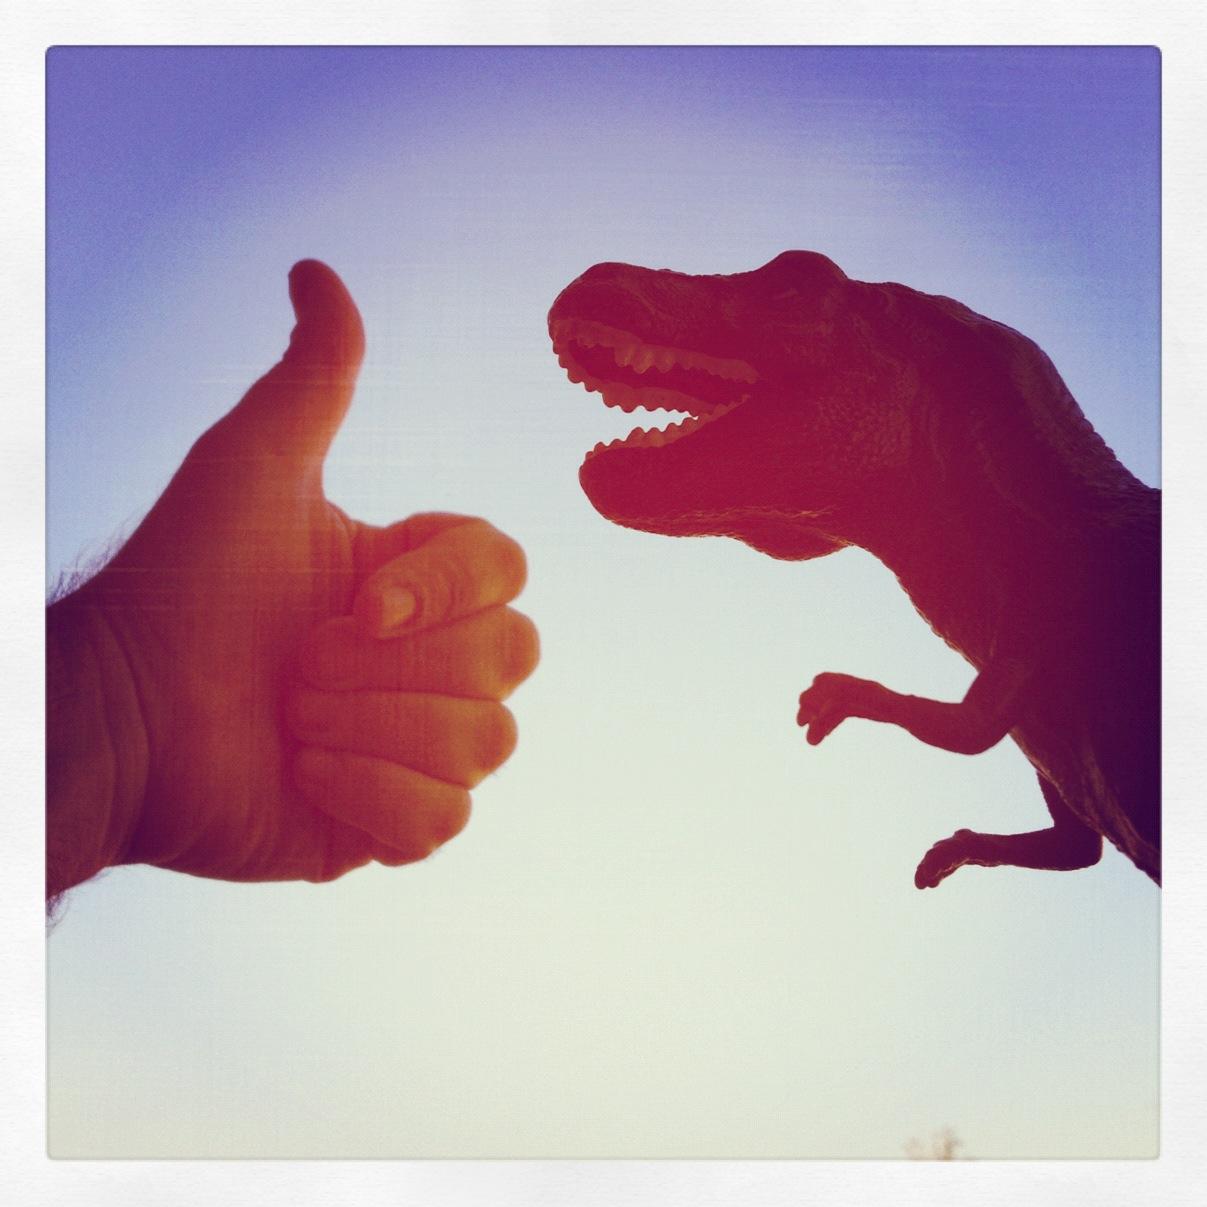 T-Rex Adventures di @osnuflaz // Iger della settimana